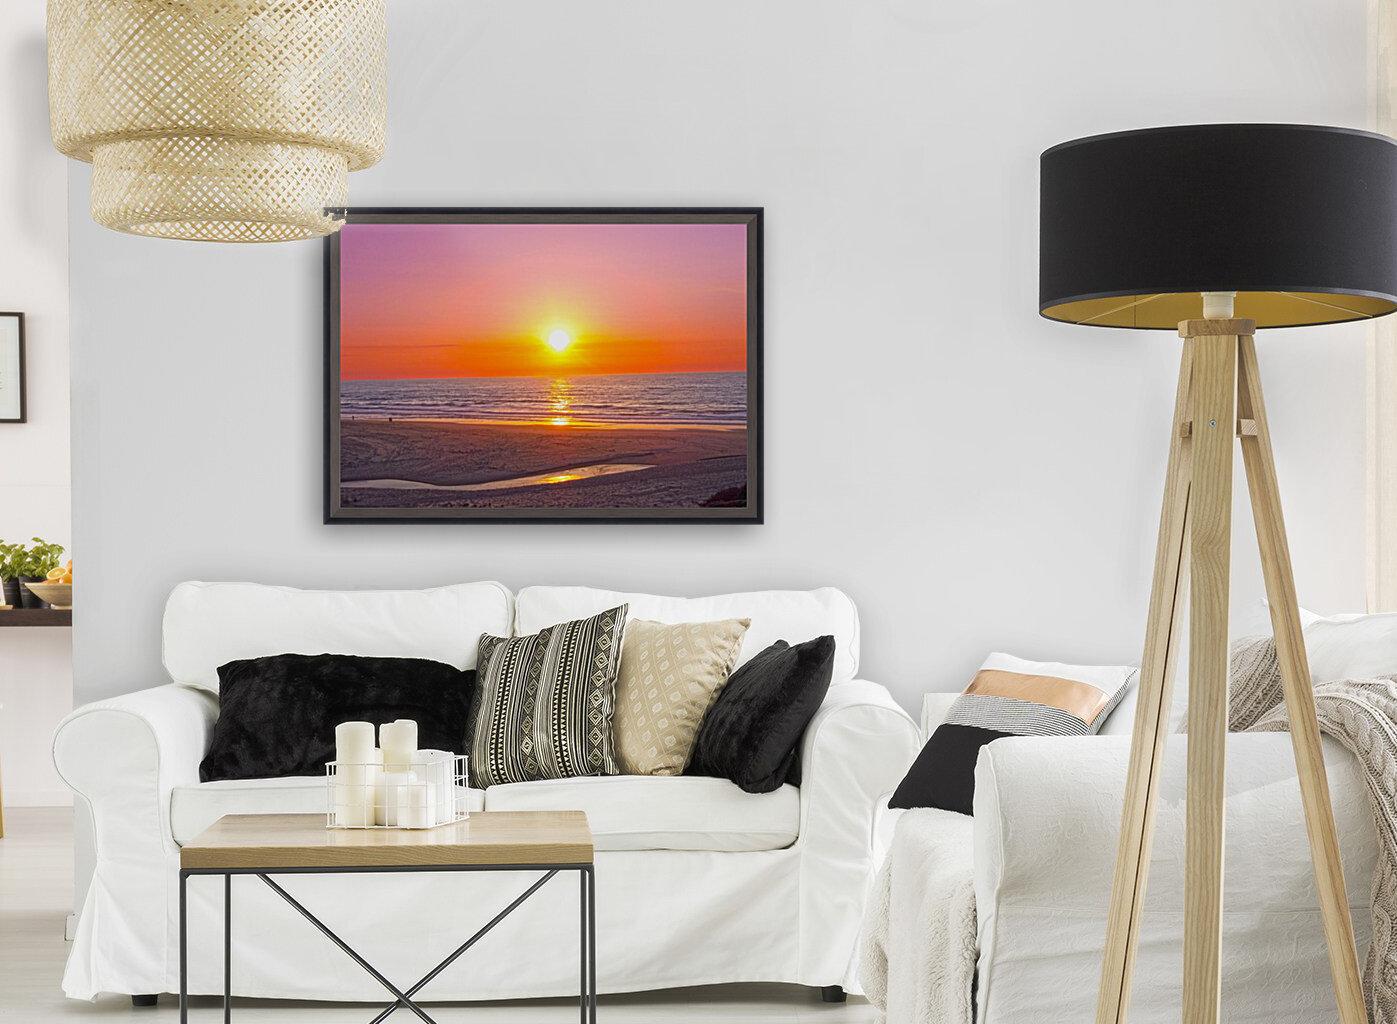 Serenity Found - Calming Atlantic Sunset in Portugal  Art